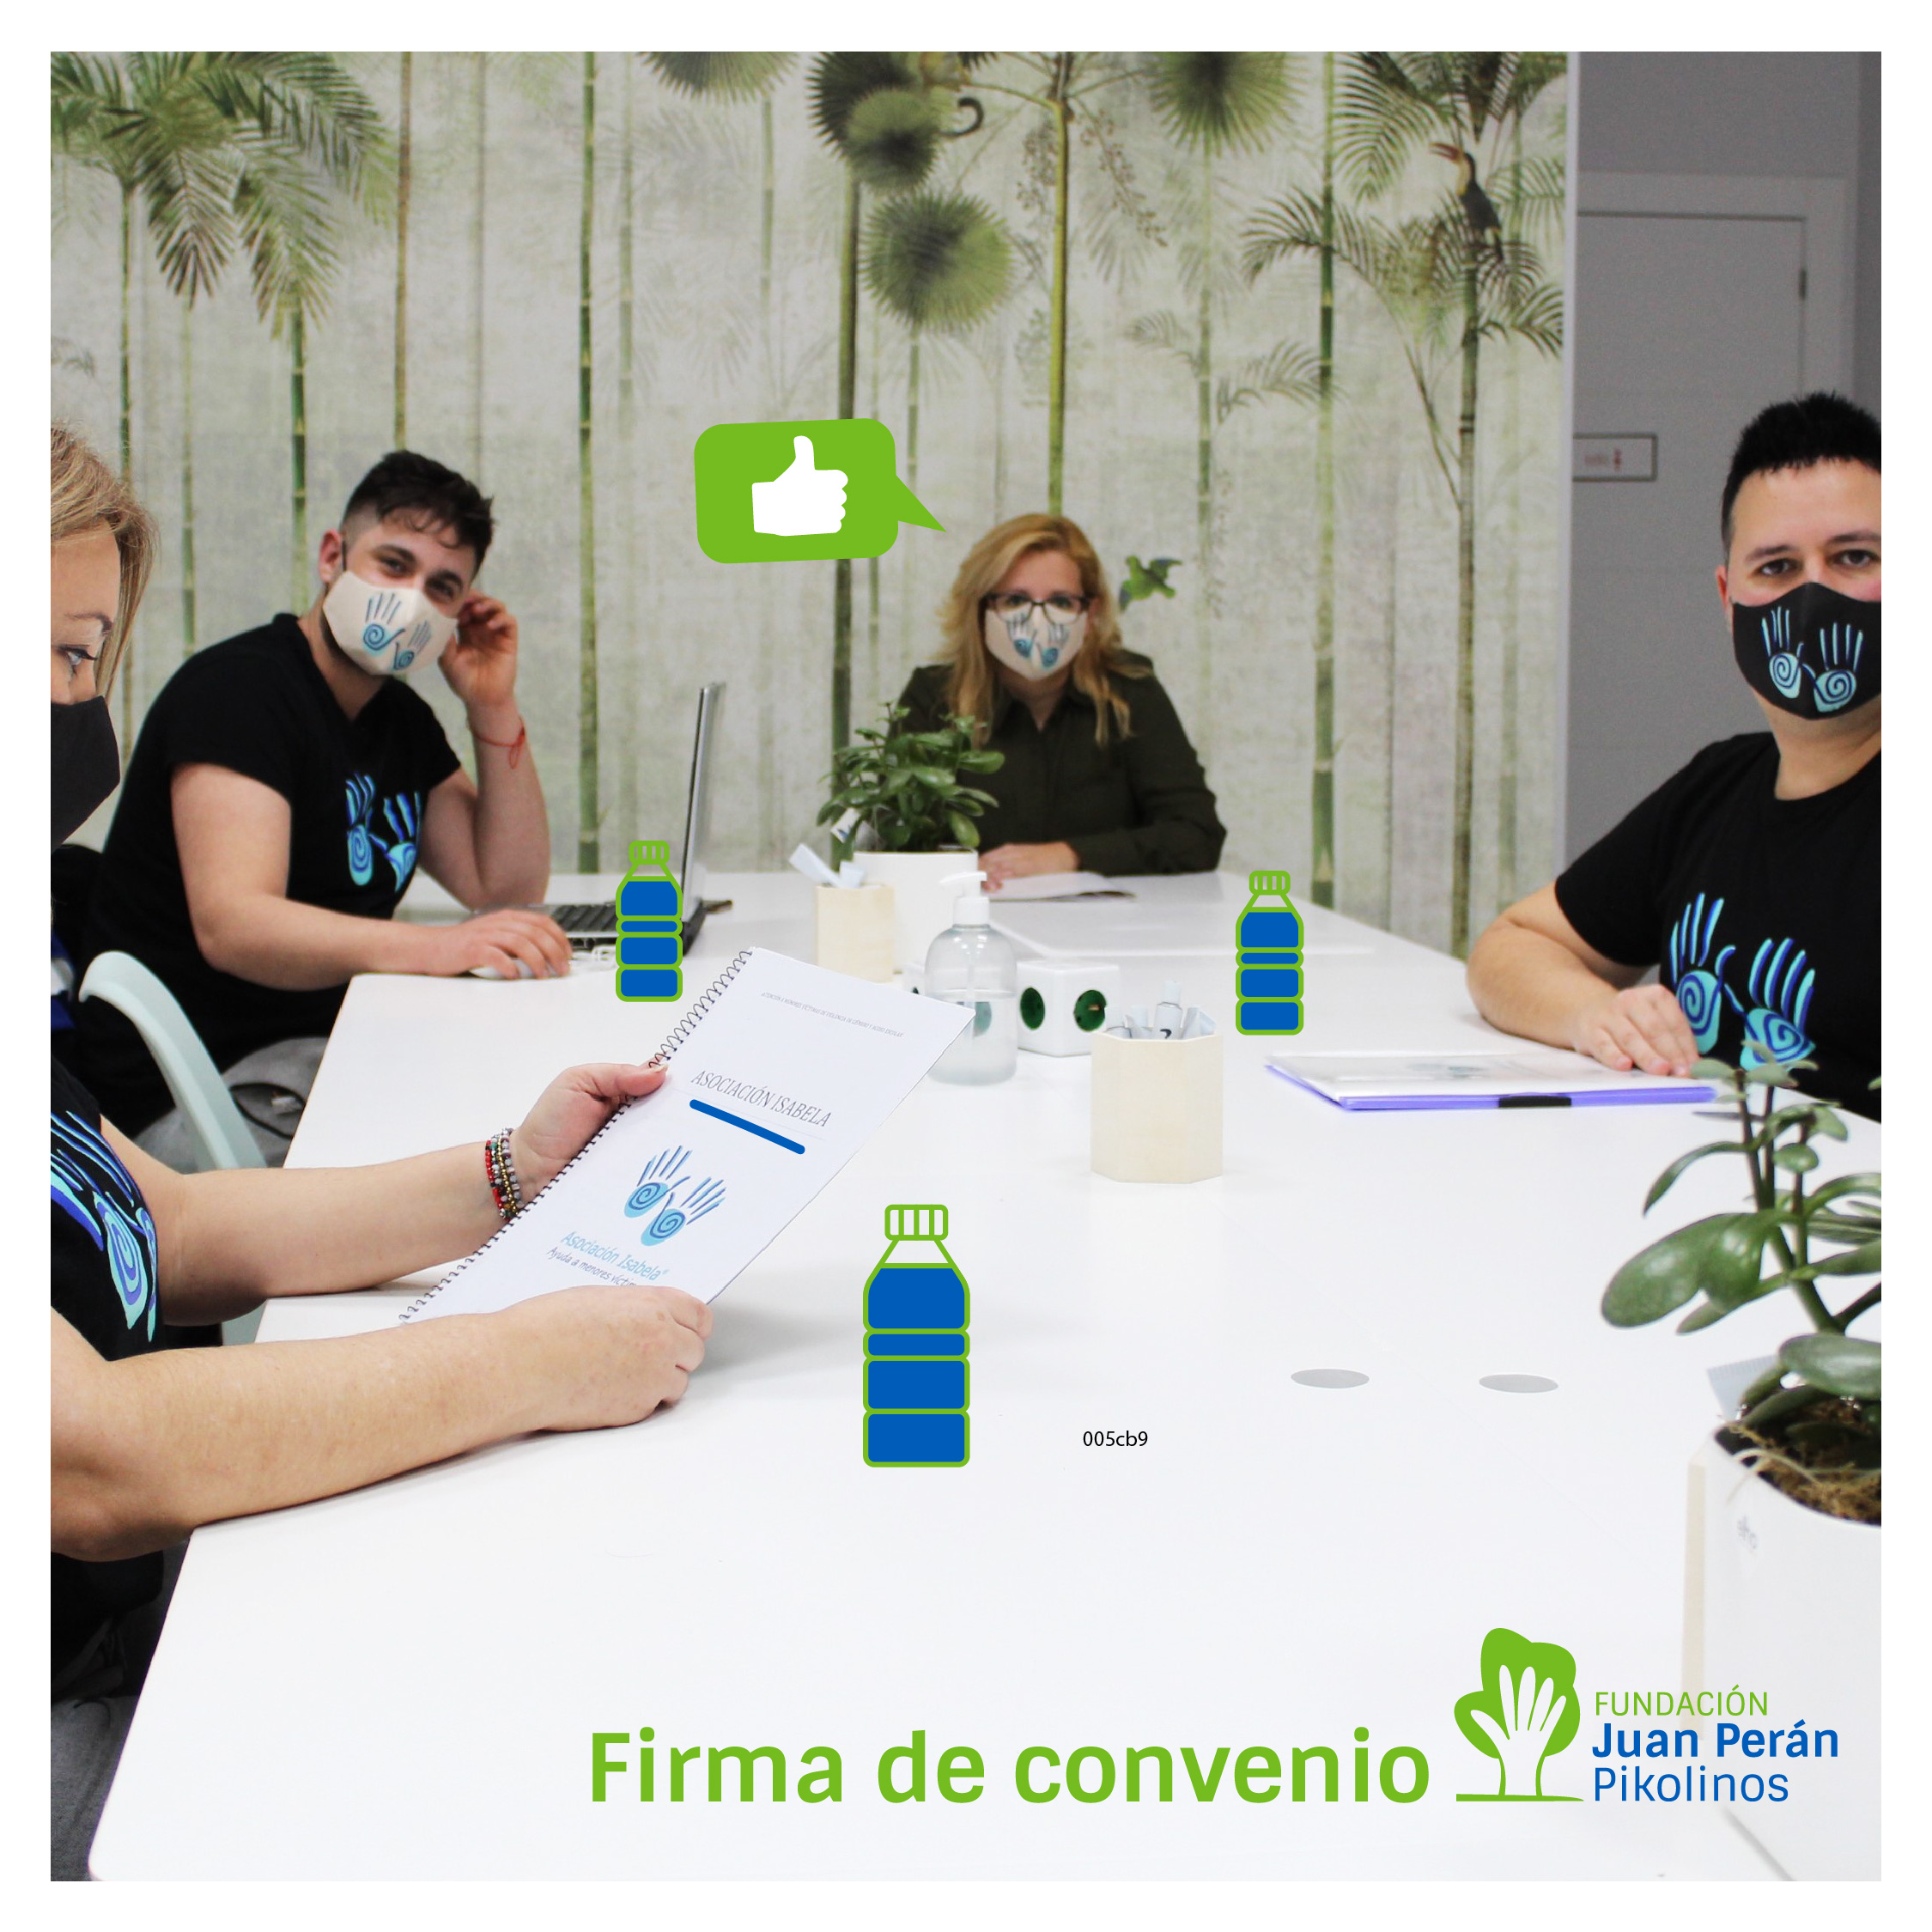 fundacion_rrss_asociacionisabela_convenio_2021__Mesa de trabajo 1